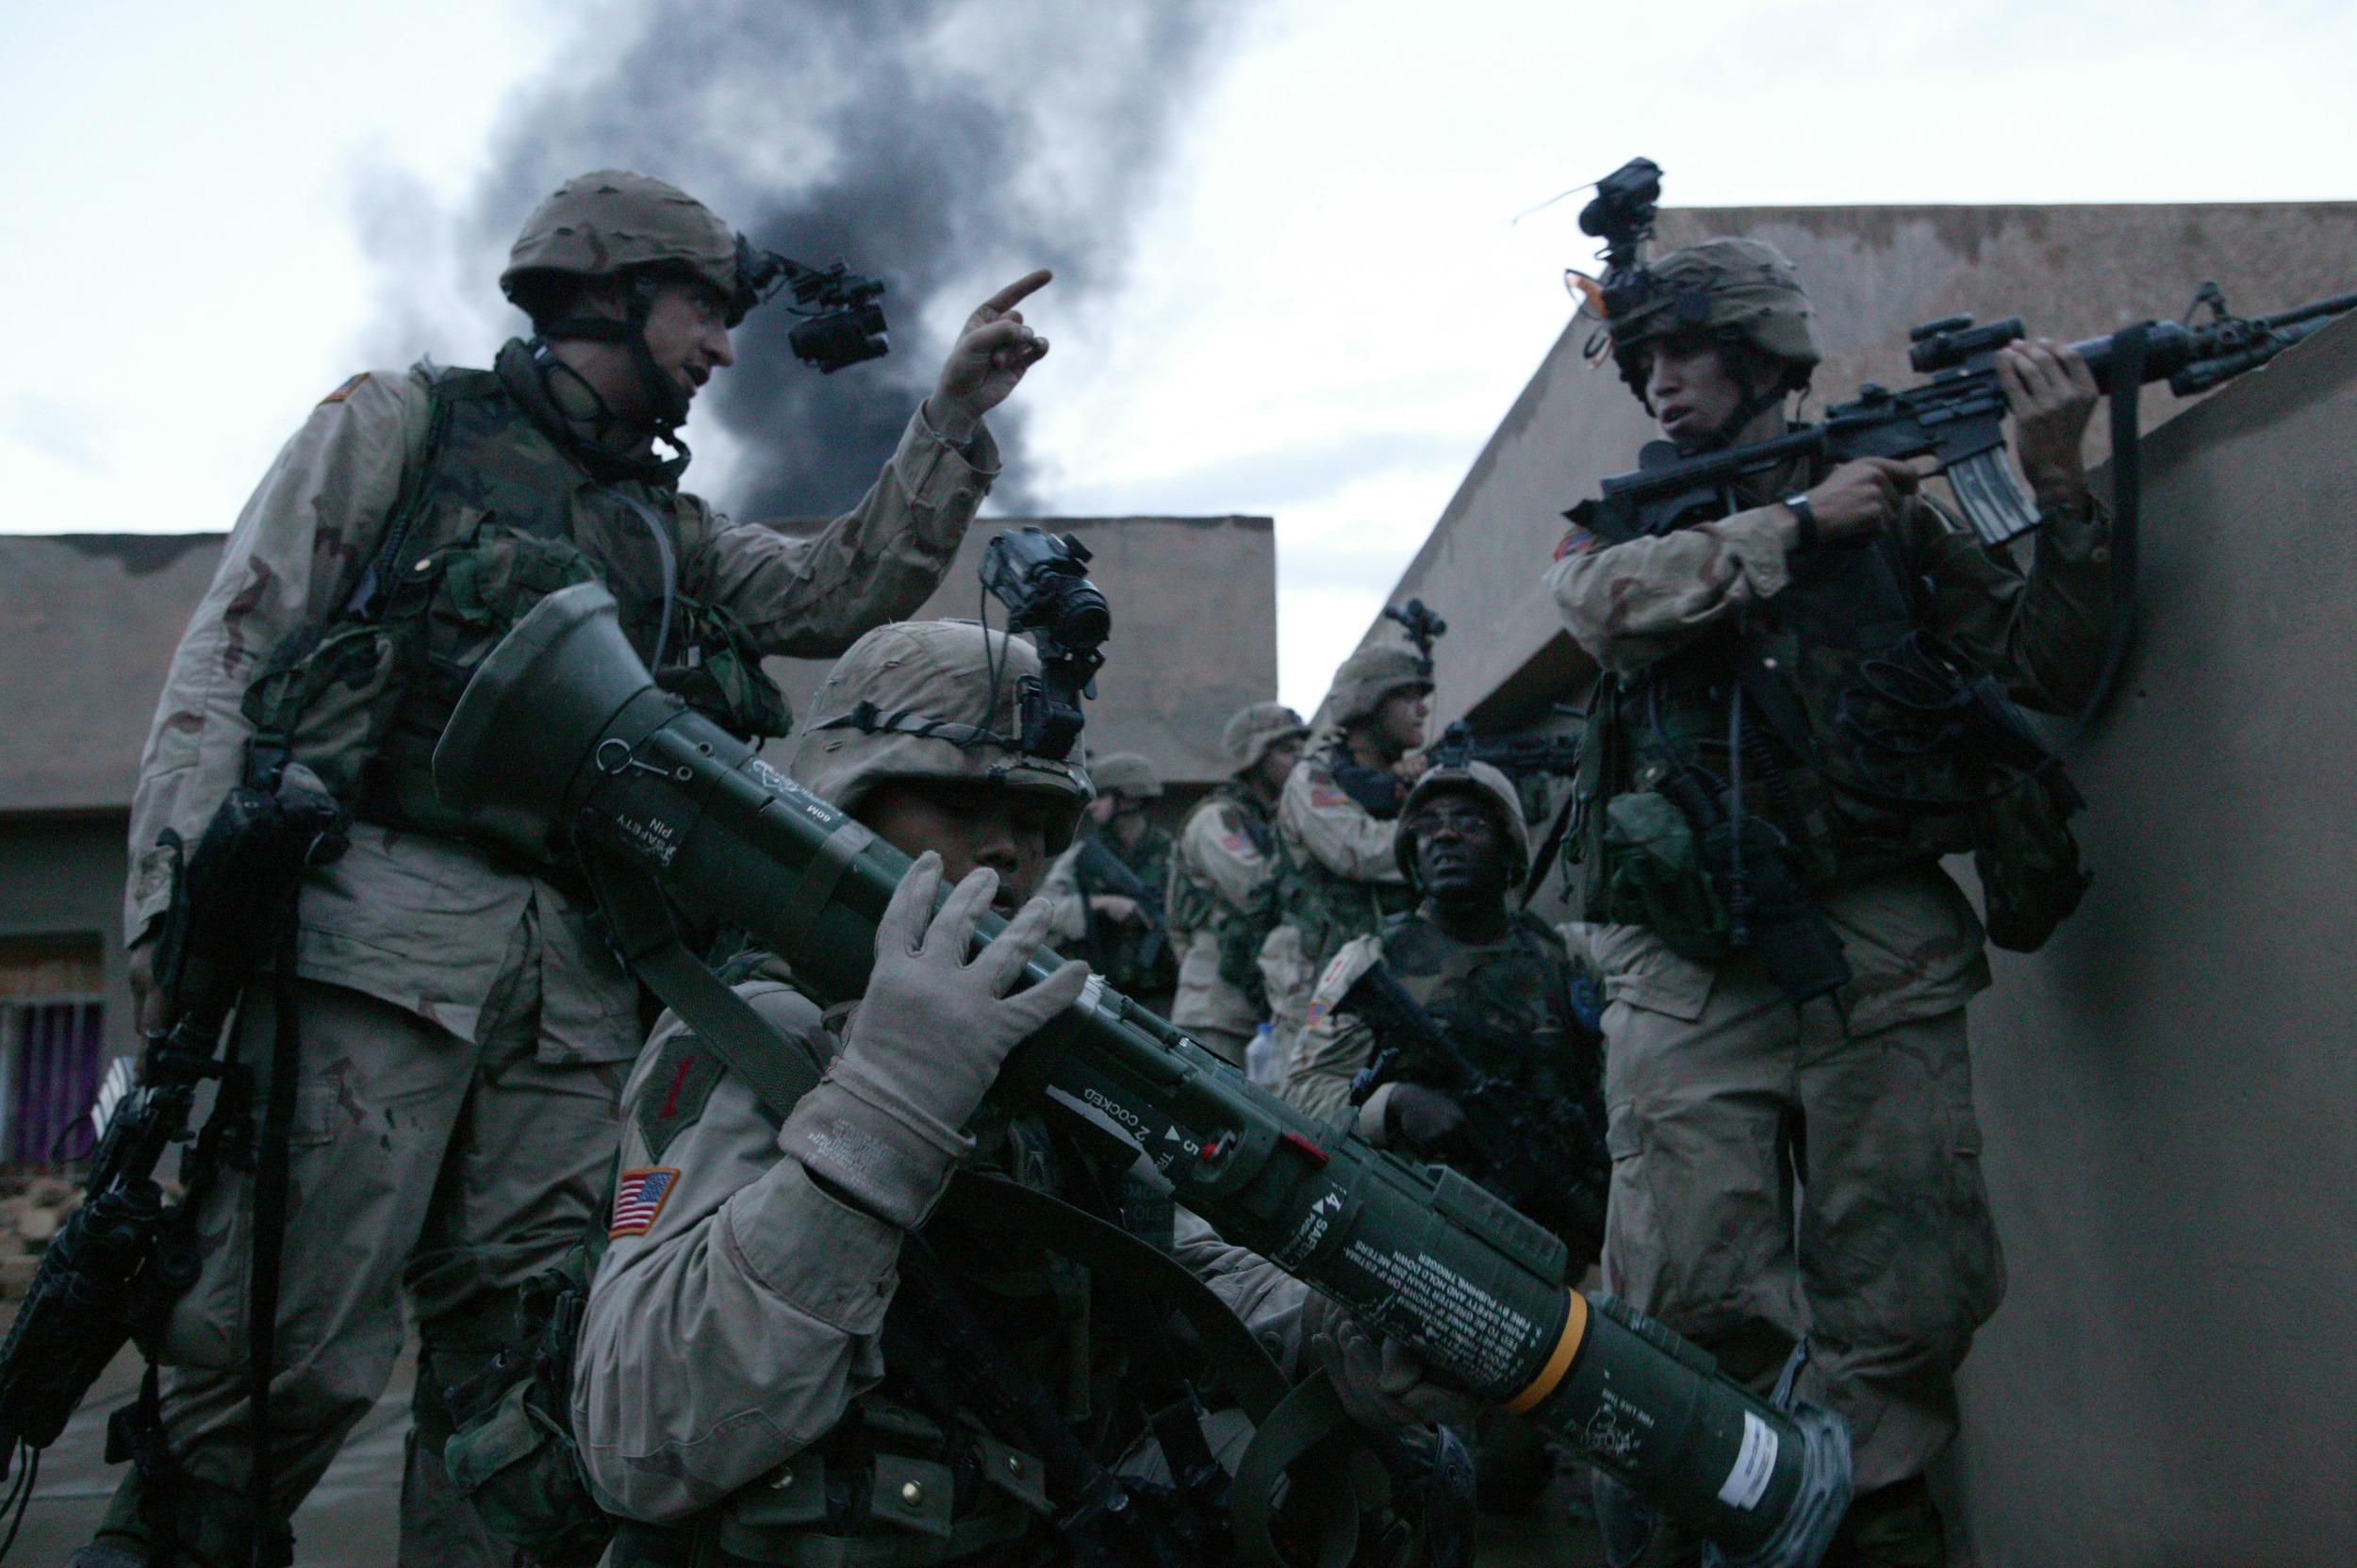 Only The Dead 14 - Credit Yuri Kosyrev _ Noor Images_U.S. Troops on a rooftop in Fallujah.jpg